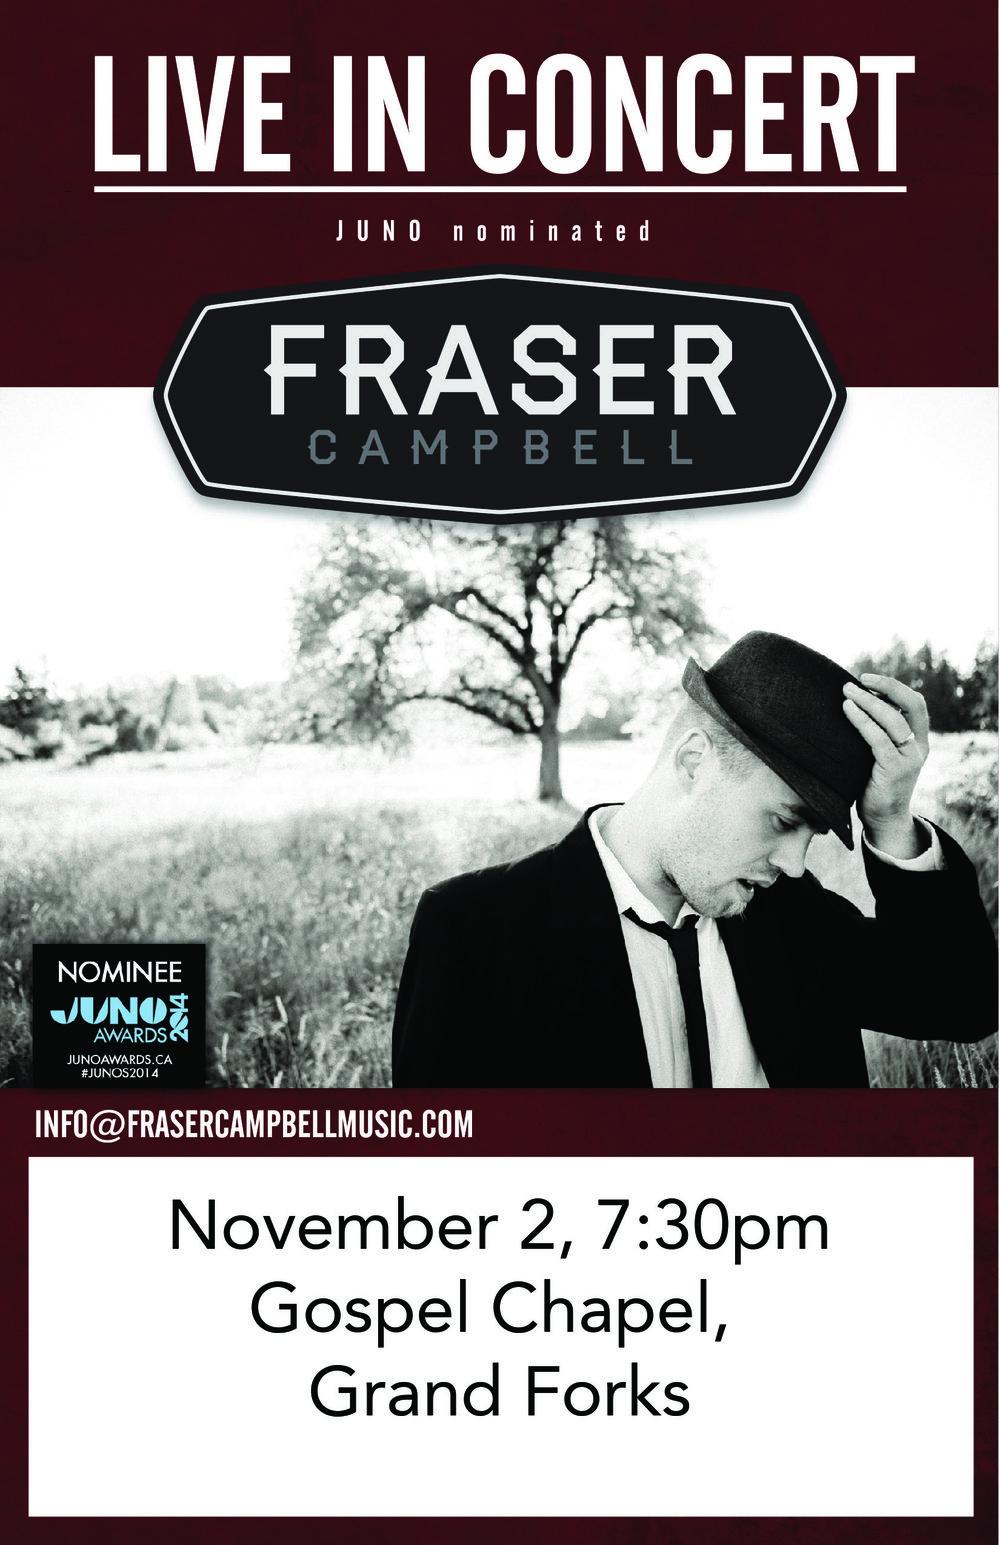 Fraser Campbell Concert.jpg